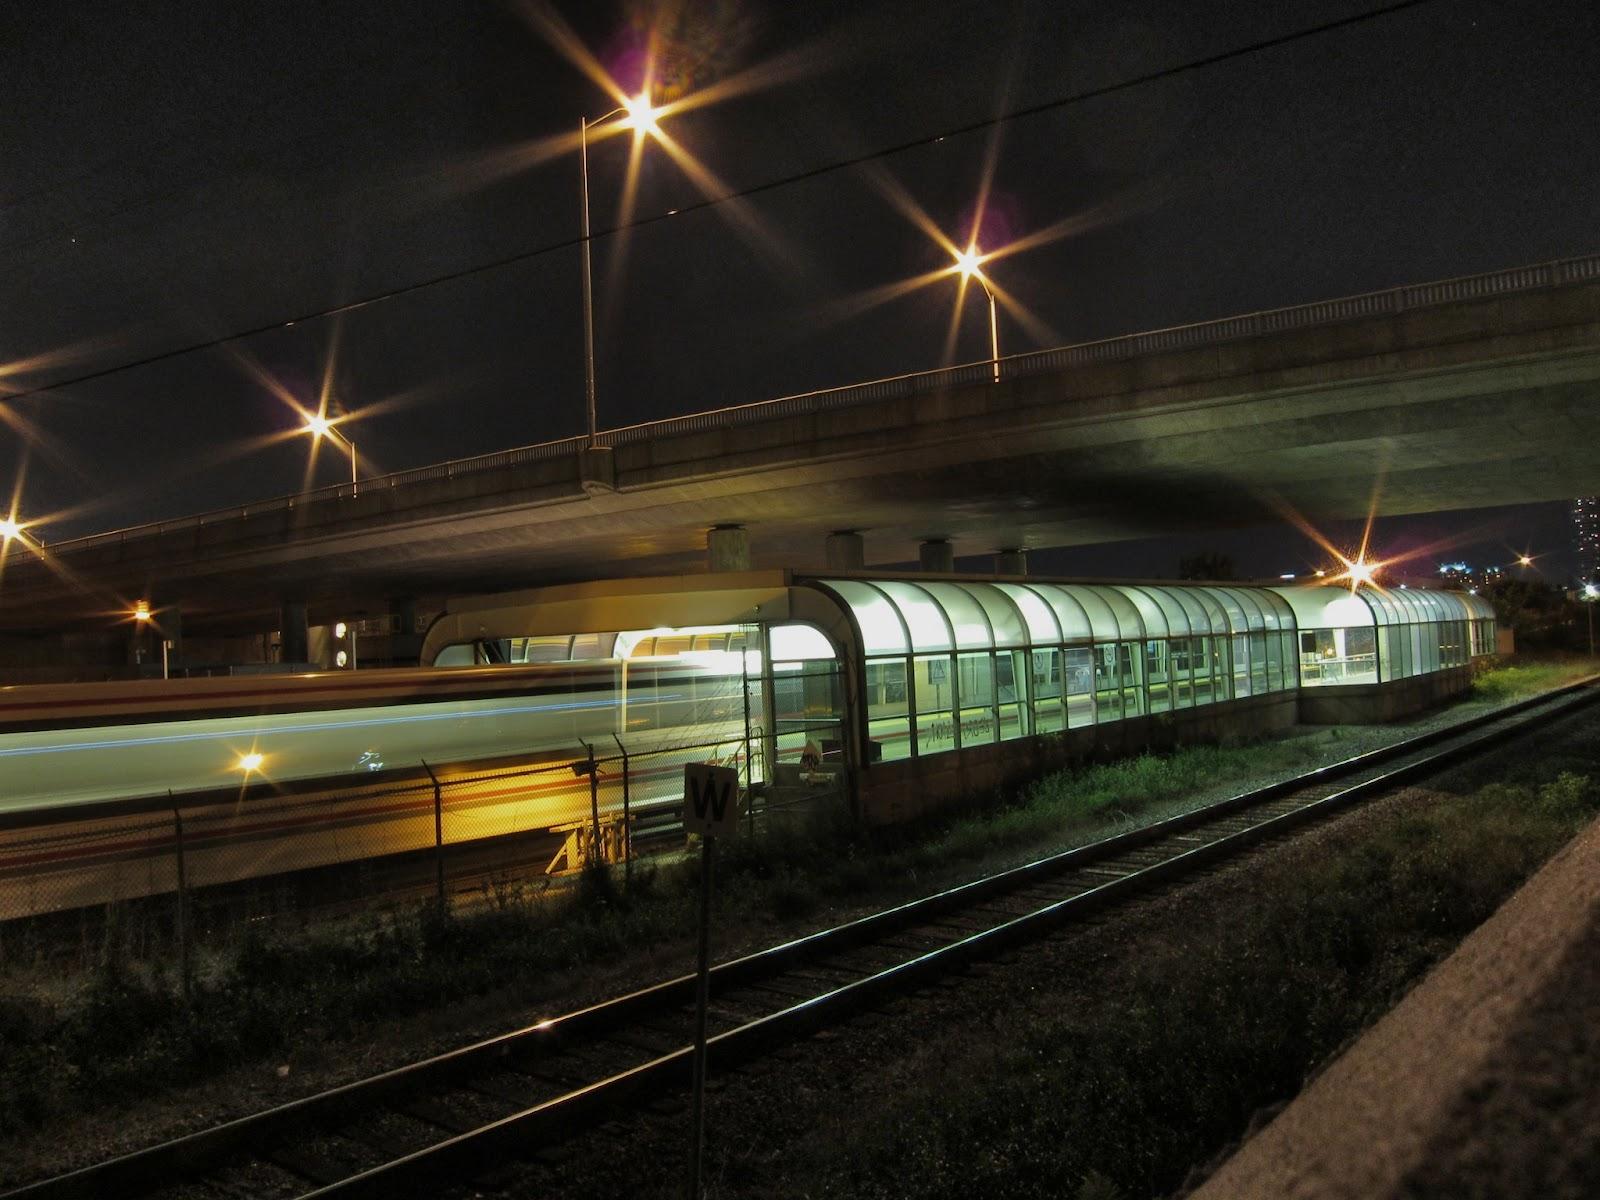 Ellesmere station exterior night view